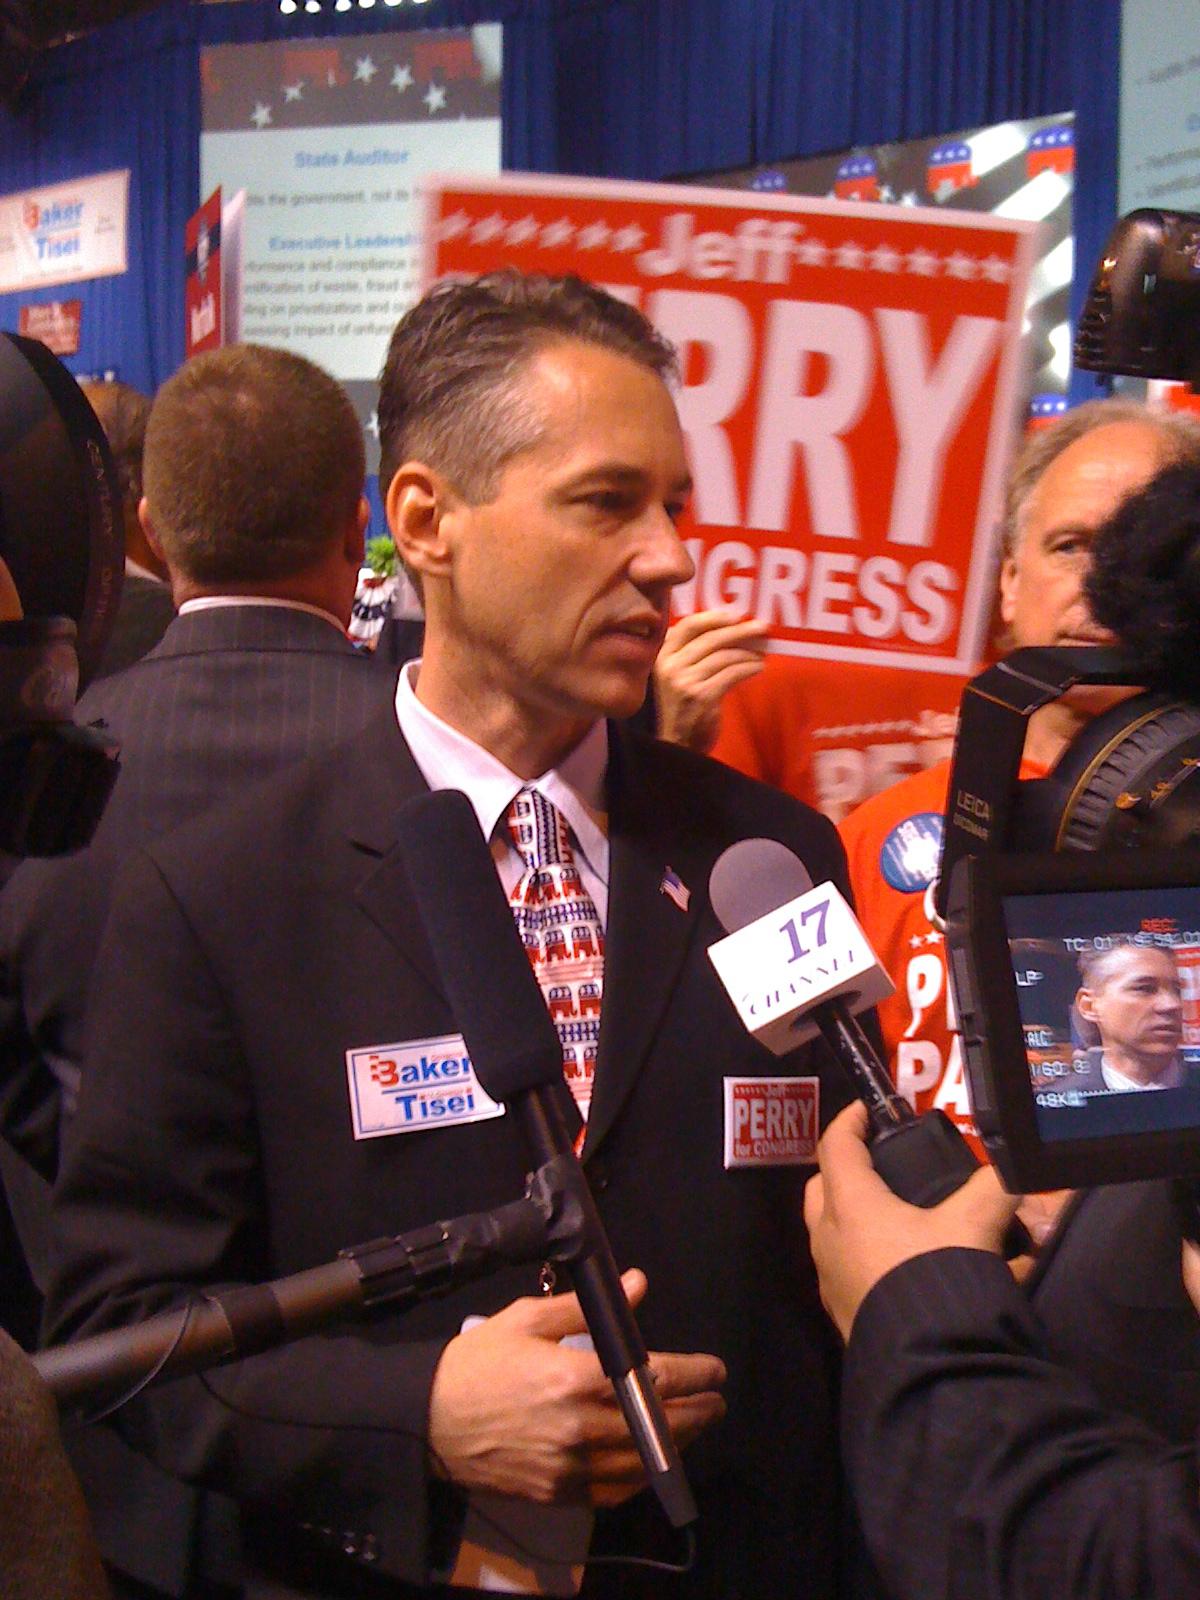 Jeff Perry (politician) - Wikipedia